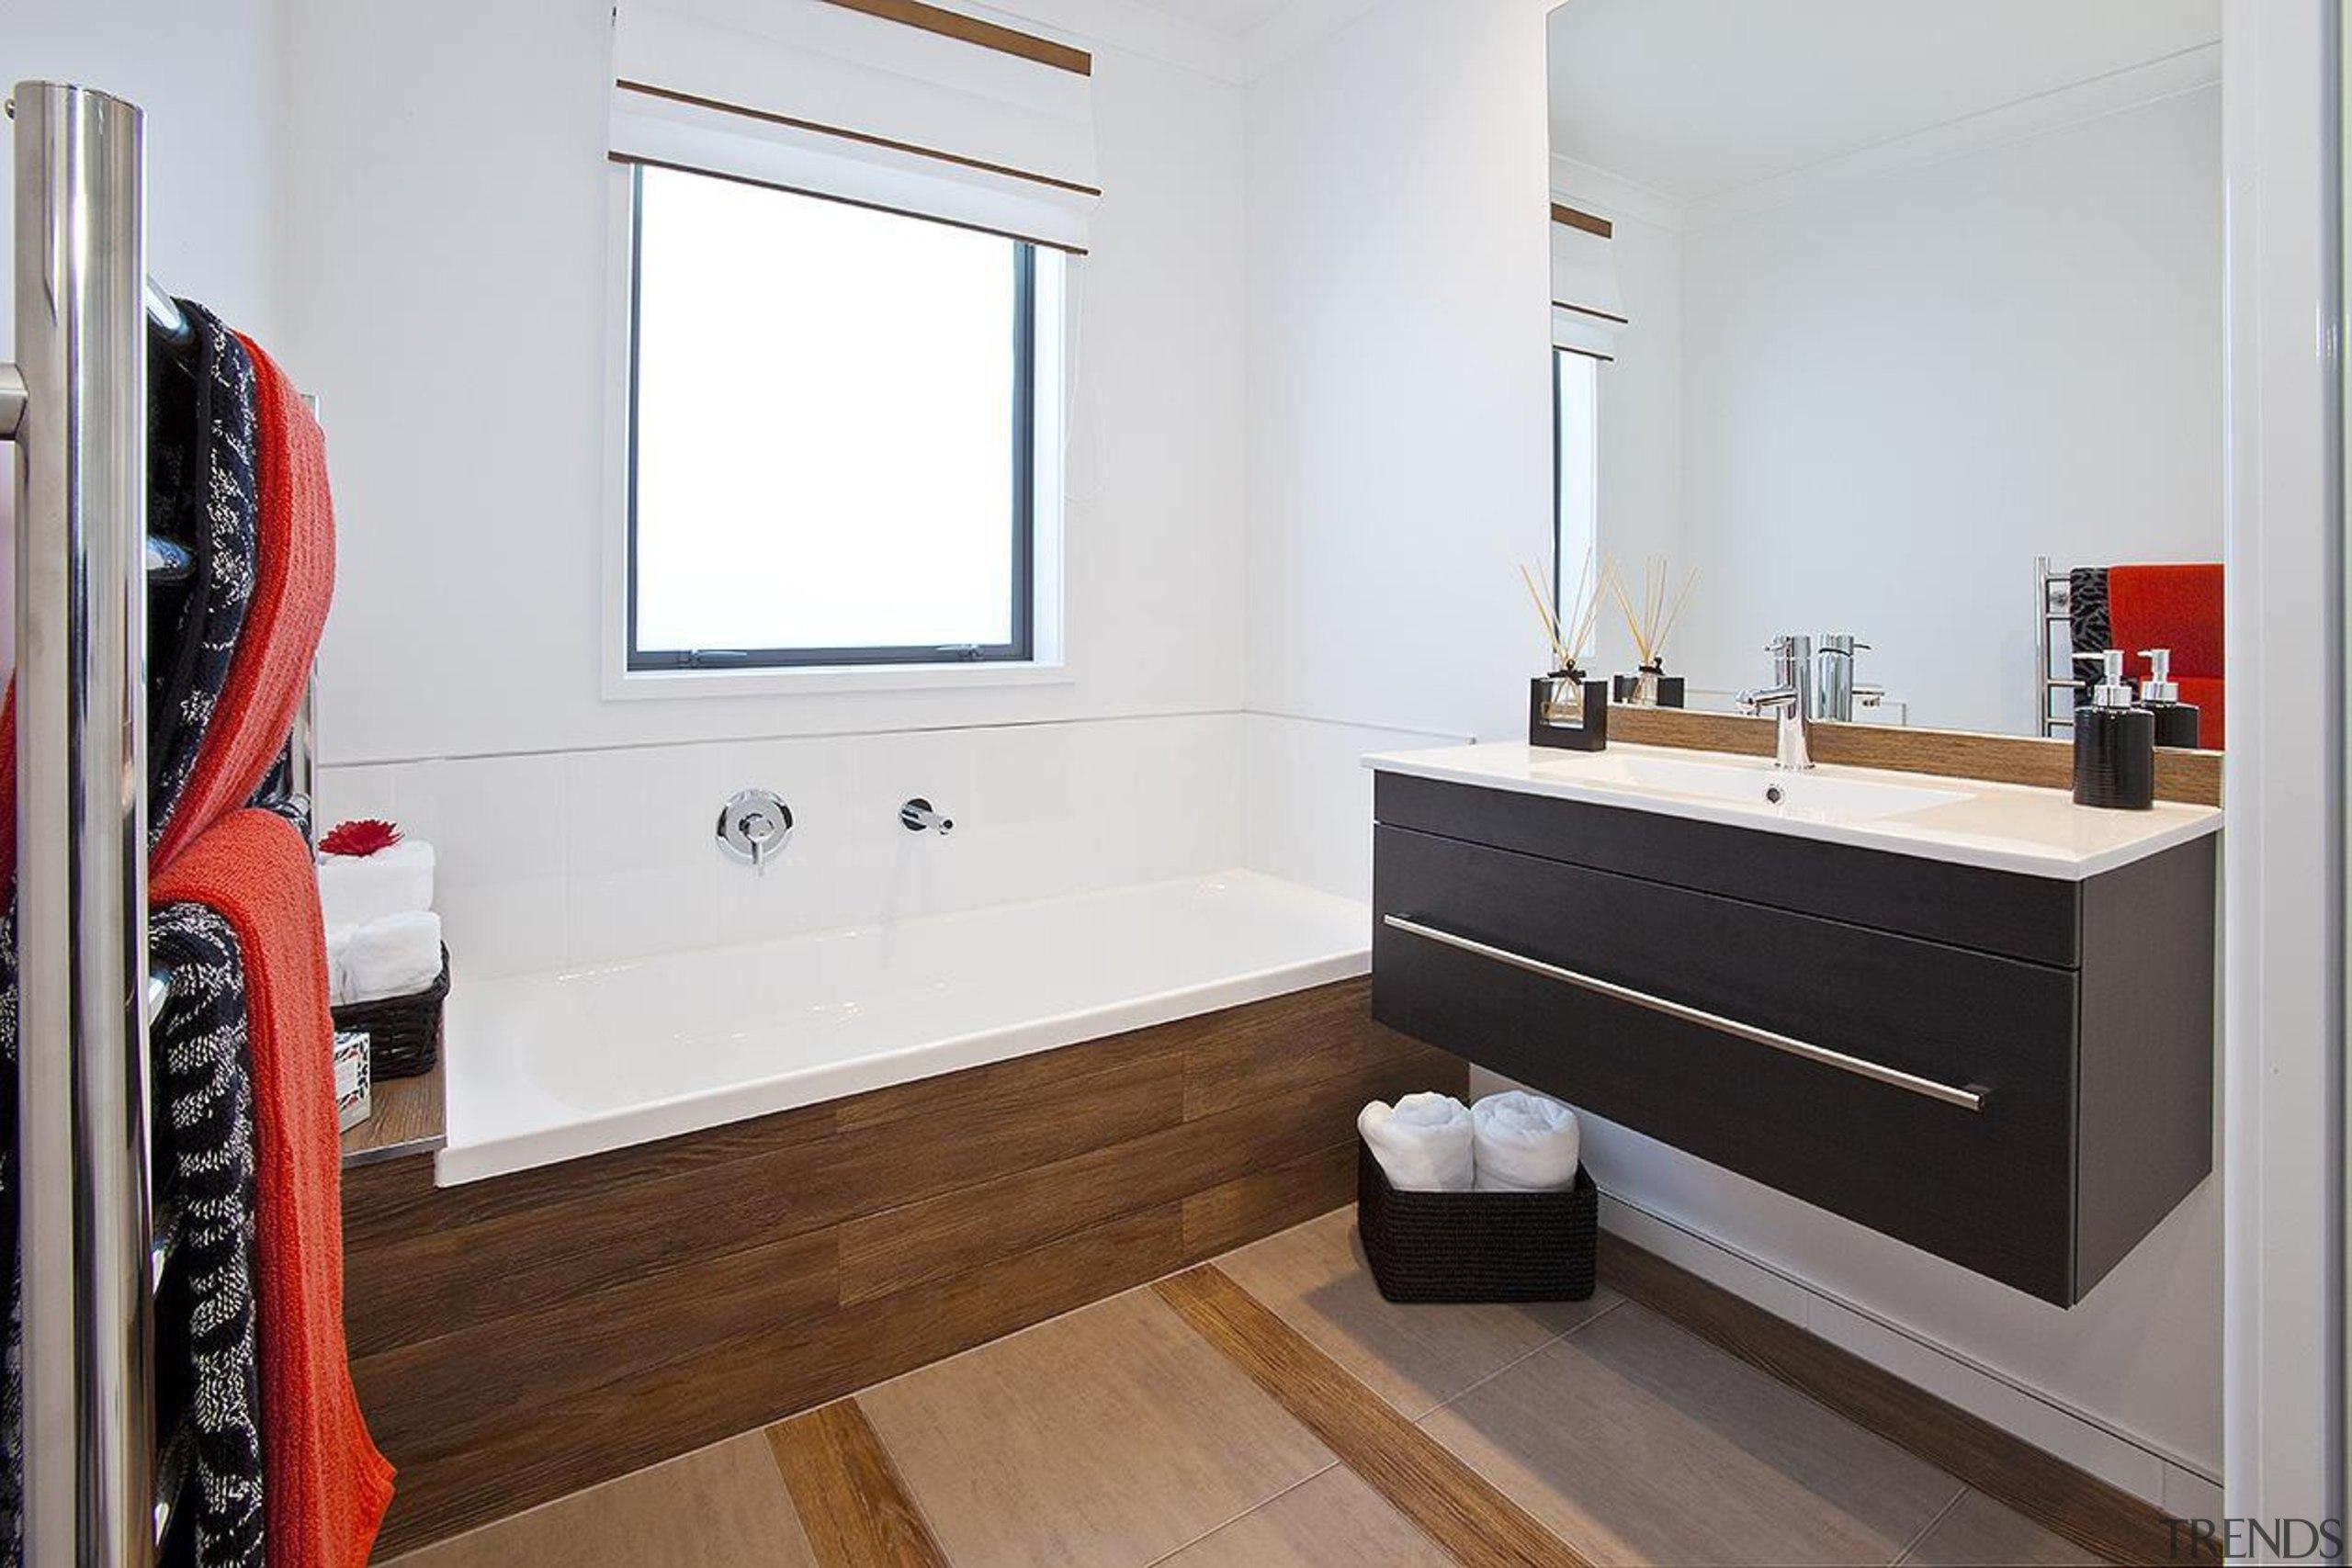 For more information, please visit www.gjgardner.co.nz bathroom, bathroom cabinet, floor, interior design, room, sink, white